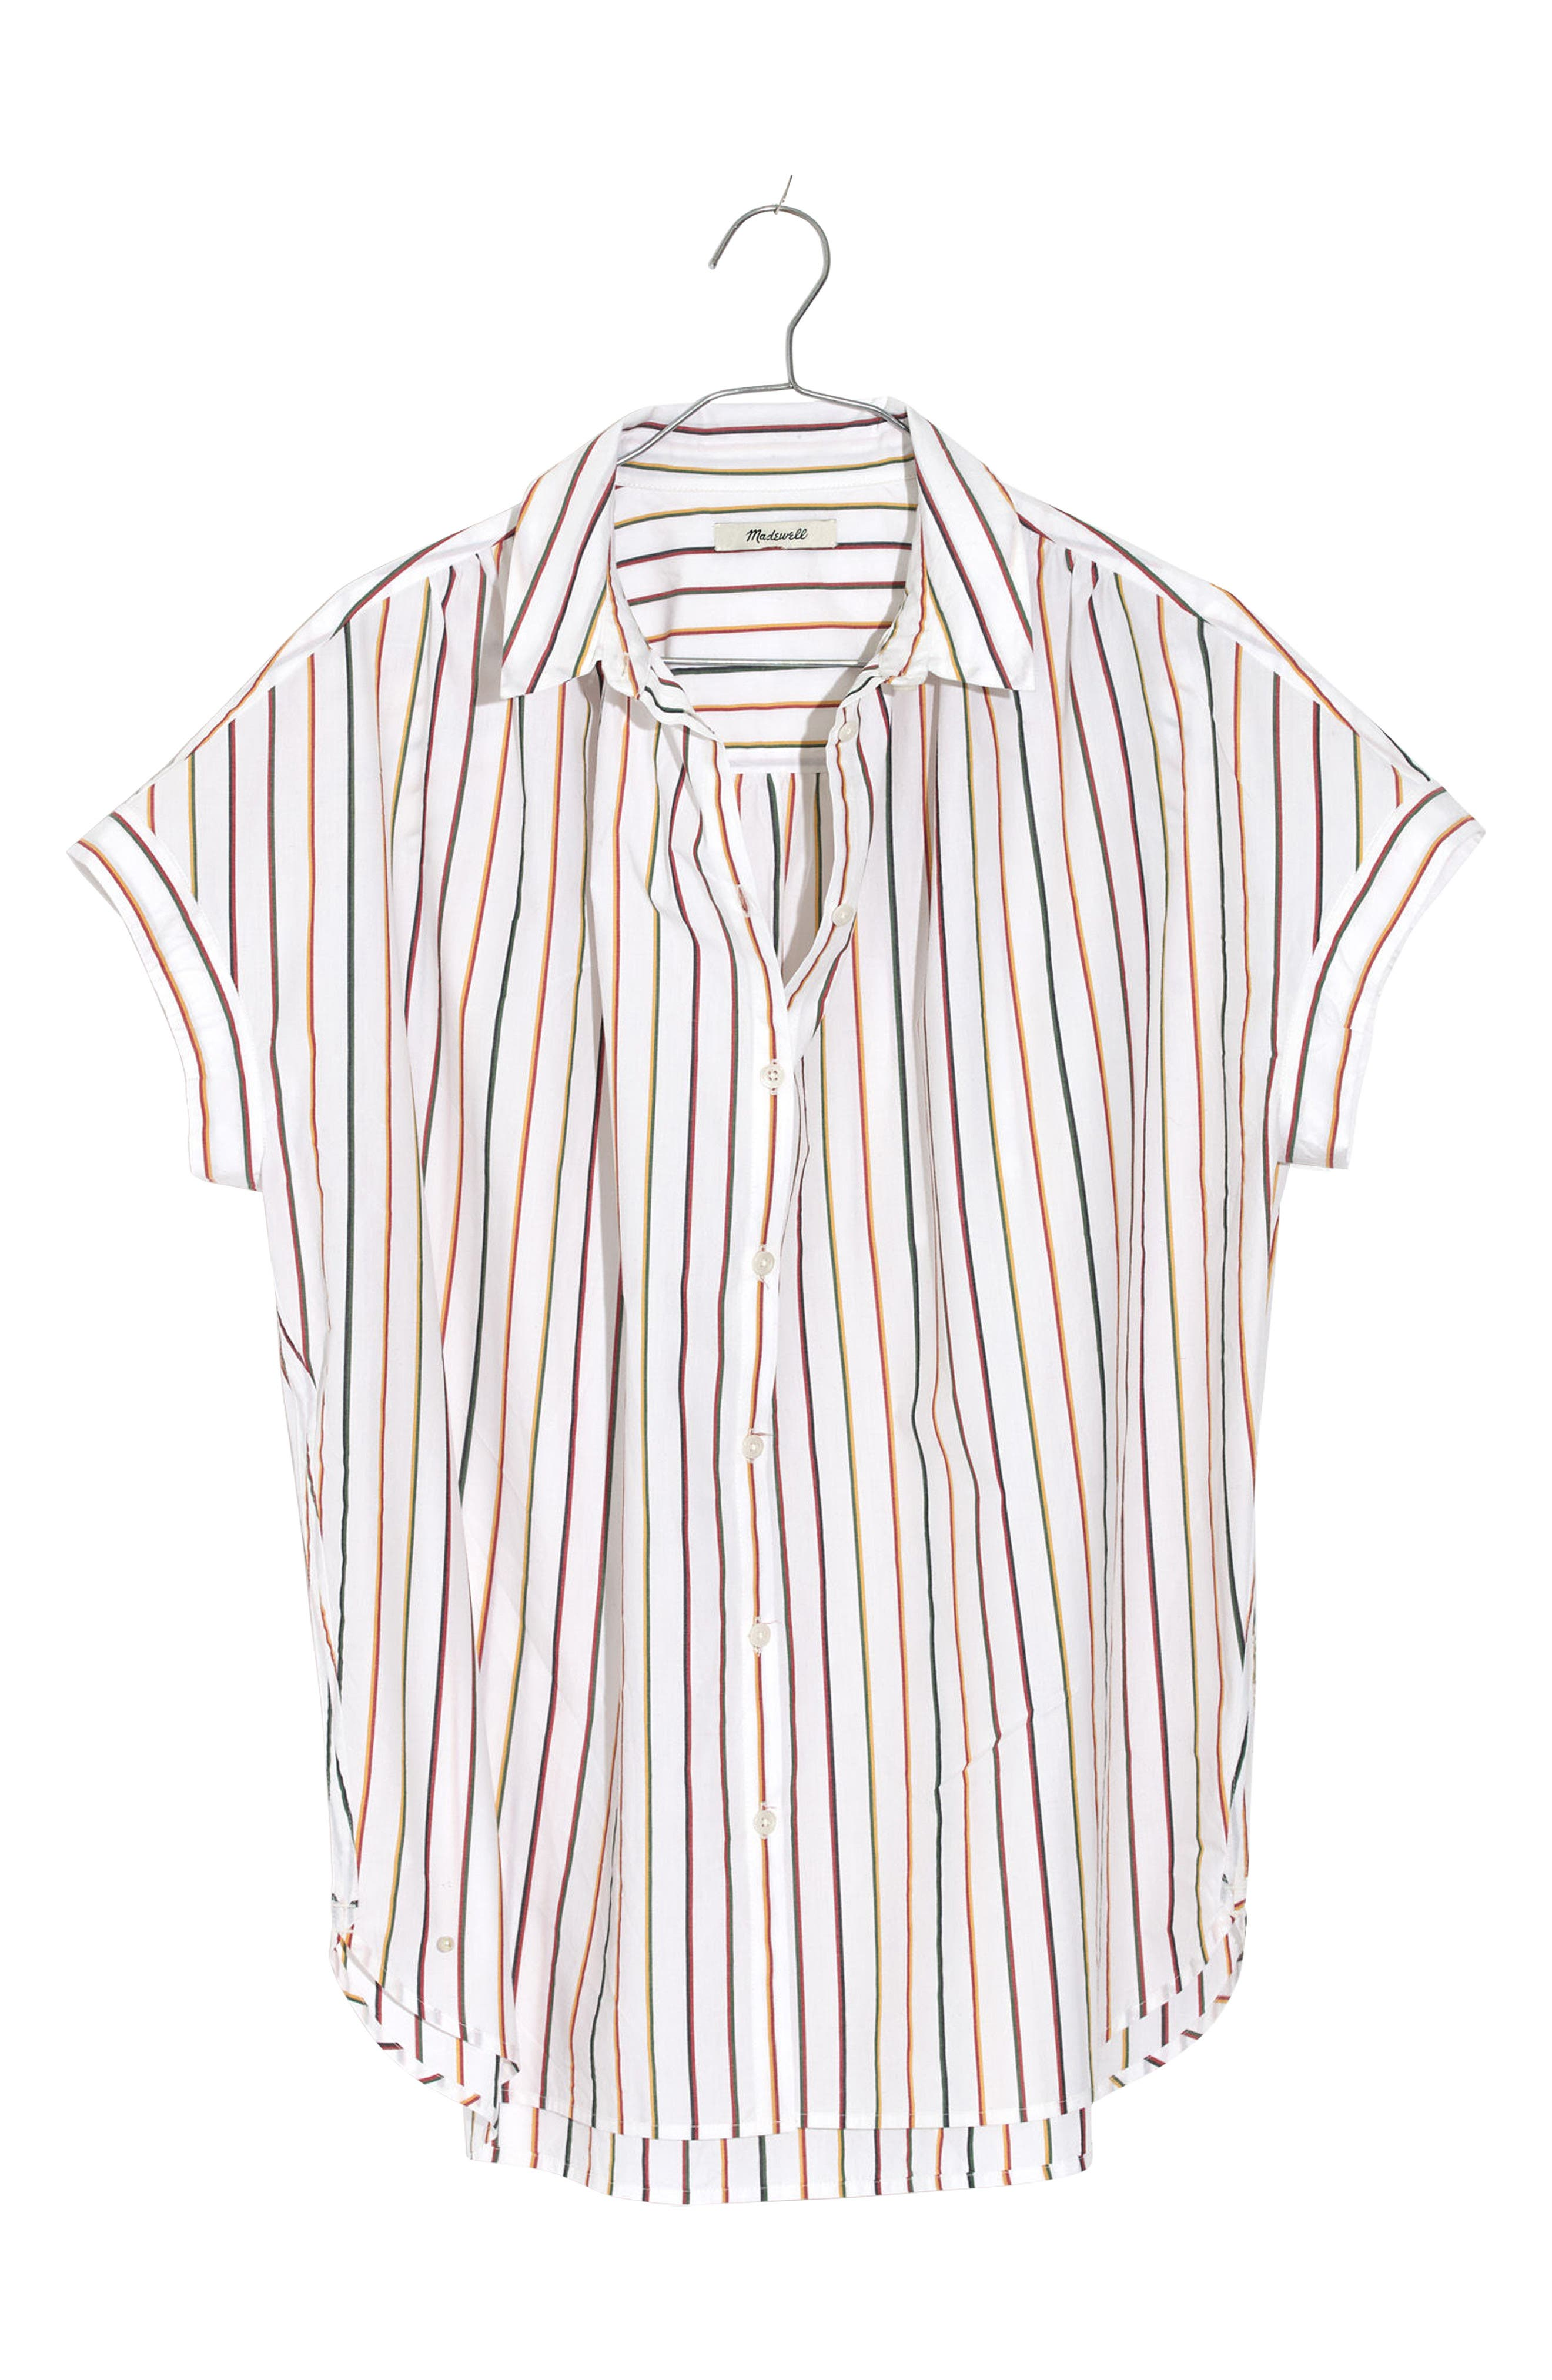 Central Sadie Stripe Shirt,                             Main thumbnail 1, color,                             Multi